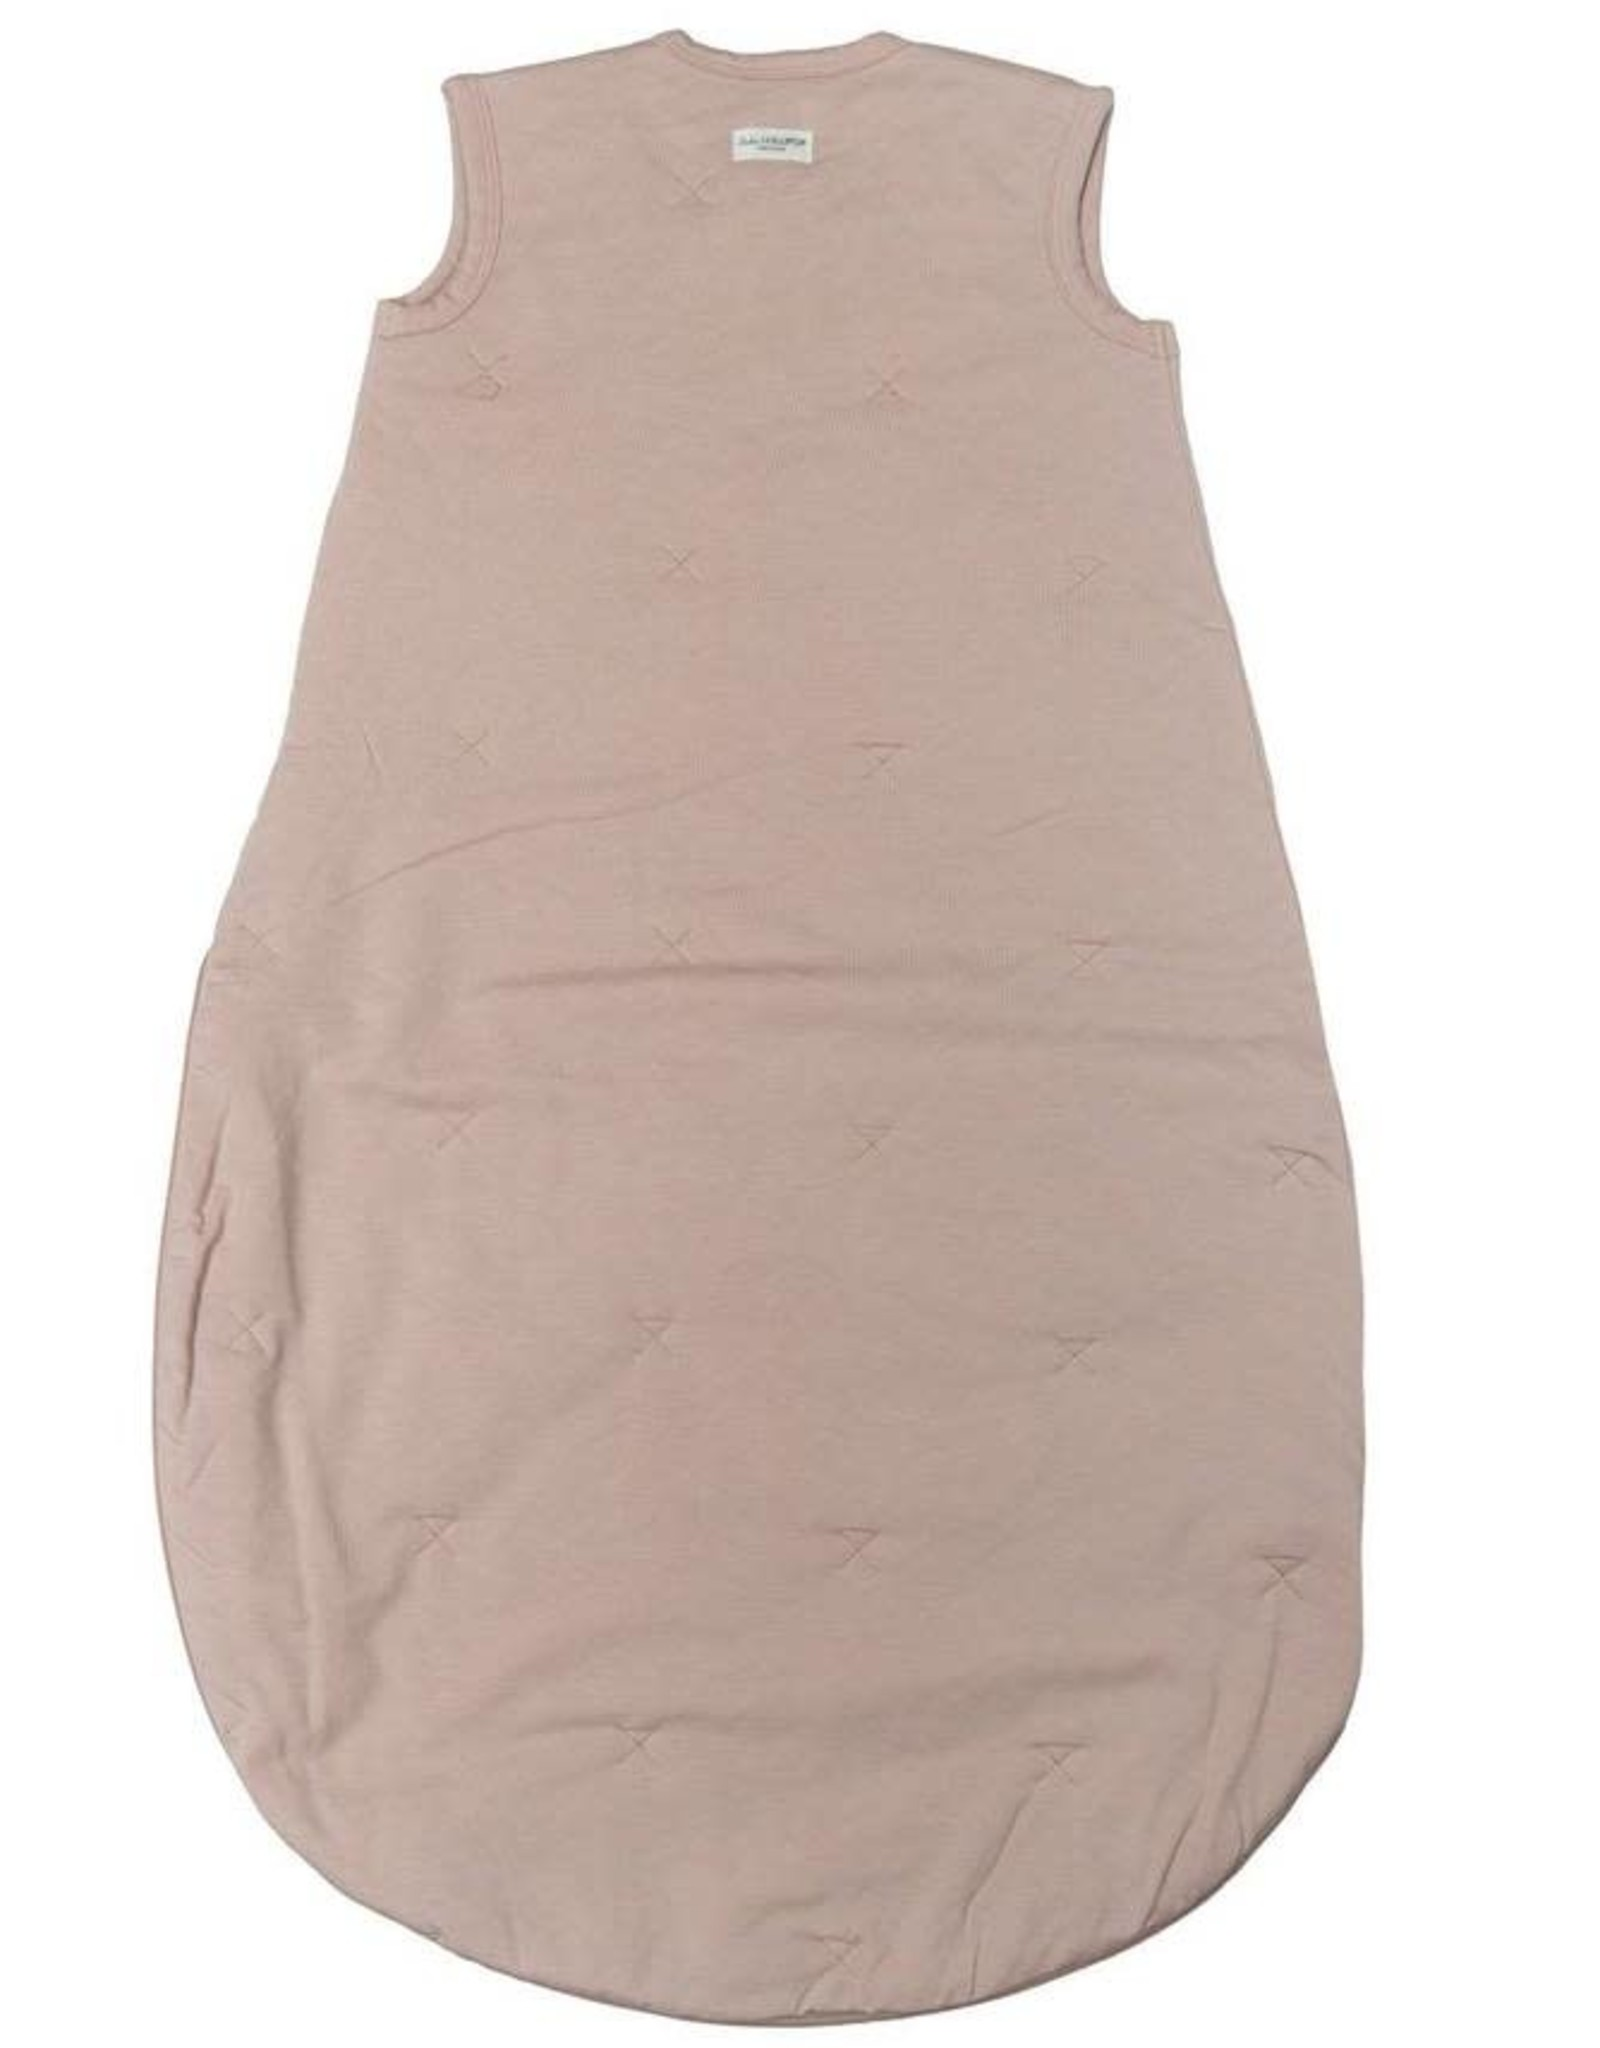 LouLou Lollipop LoulouLOLLIPOP Sleep Bag 2.5 Tog In TENCEL™ Sepia Rose